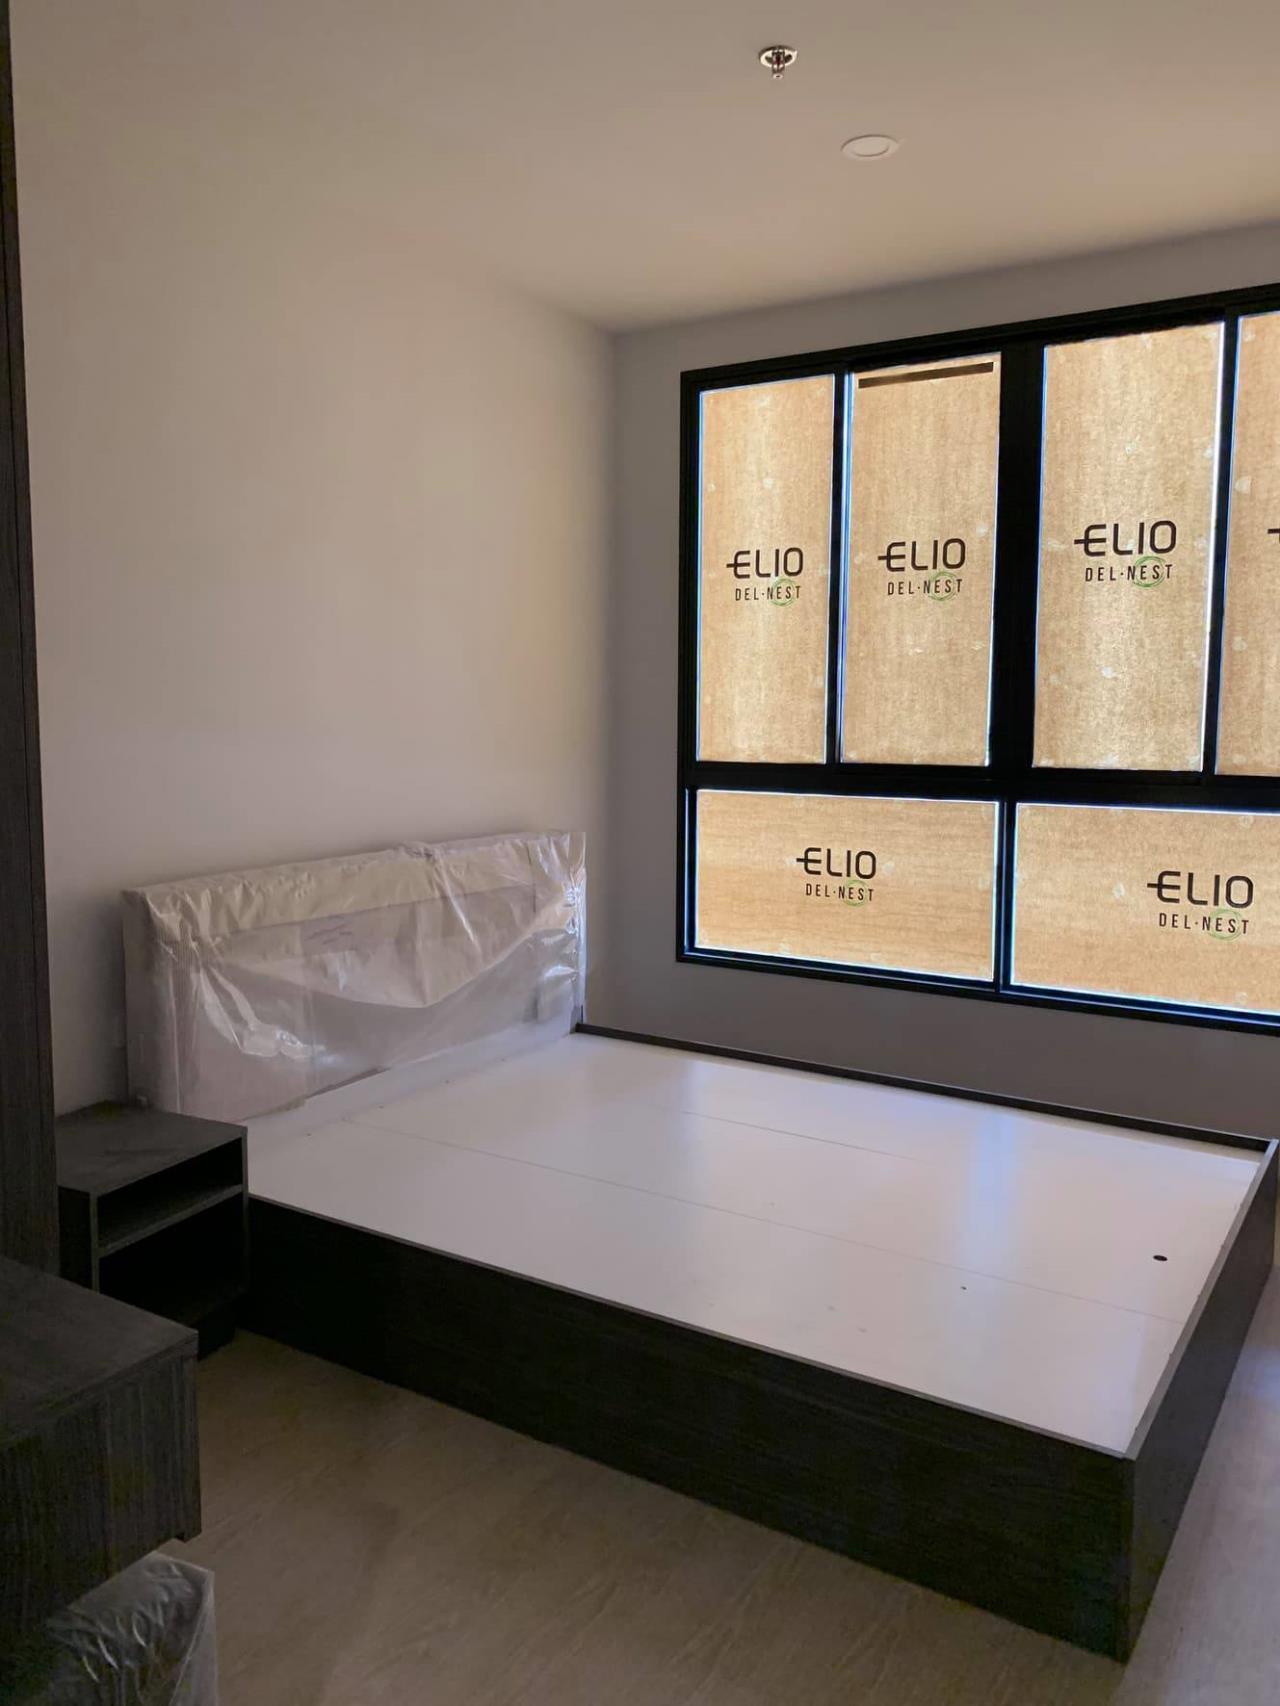 Blueocean property Agency's Condo For Rent – Elio Del Nest ( CODE : 20-06-0057-38 ) 1